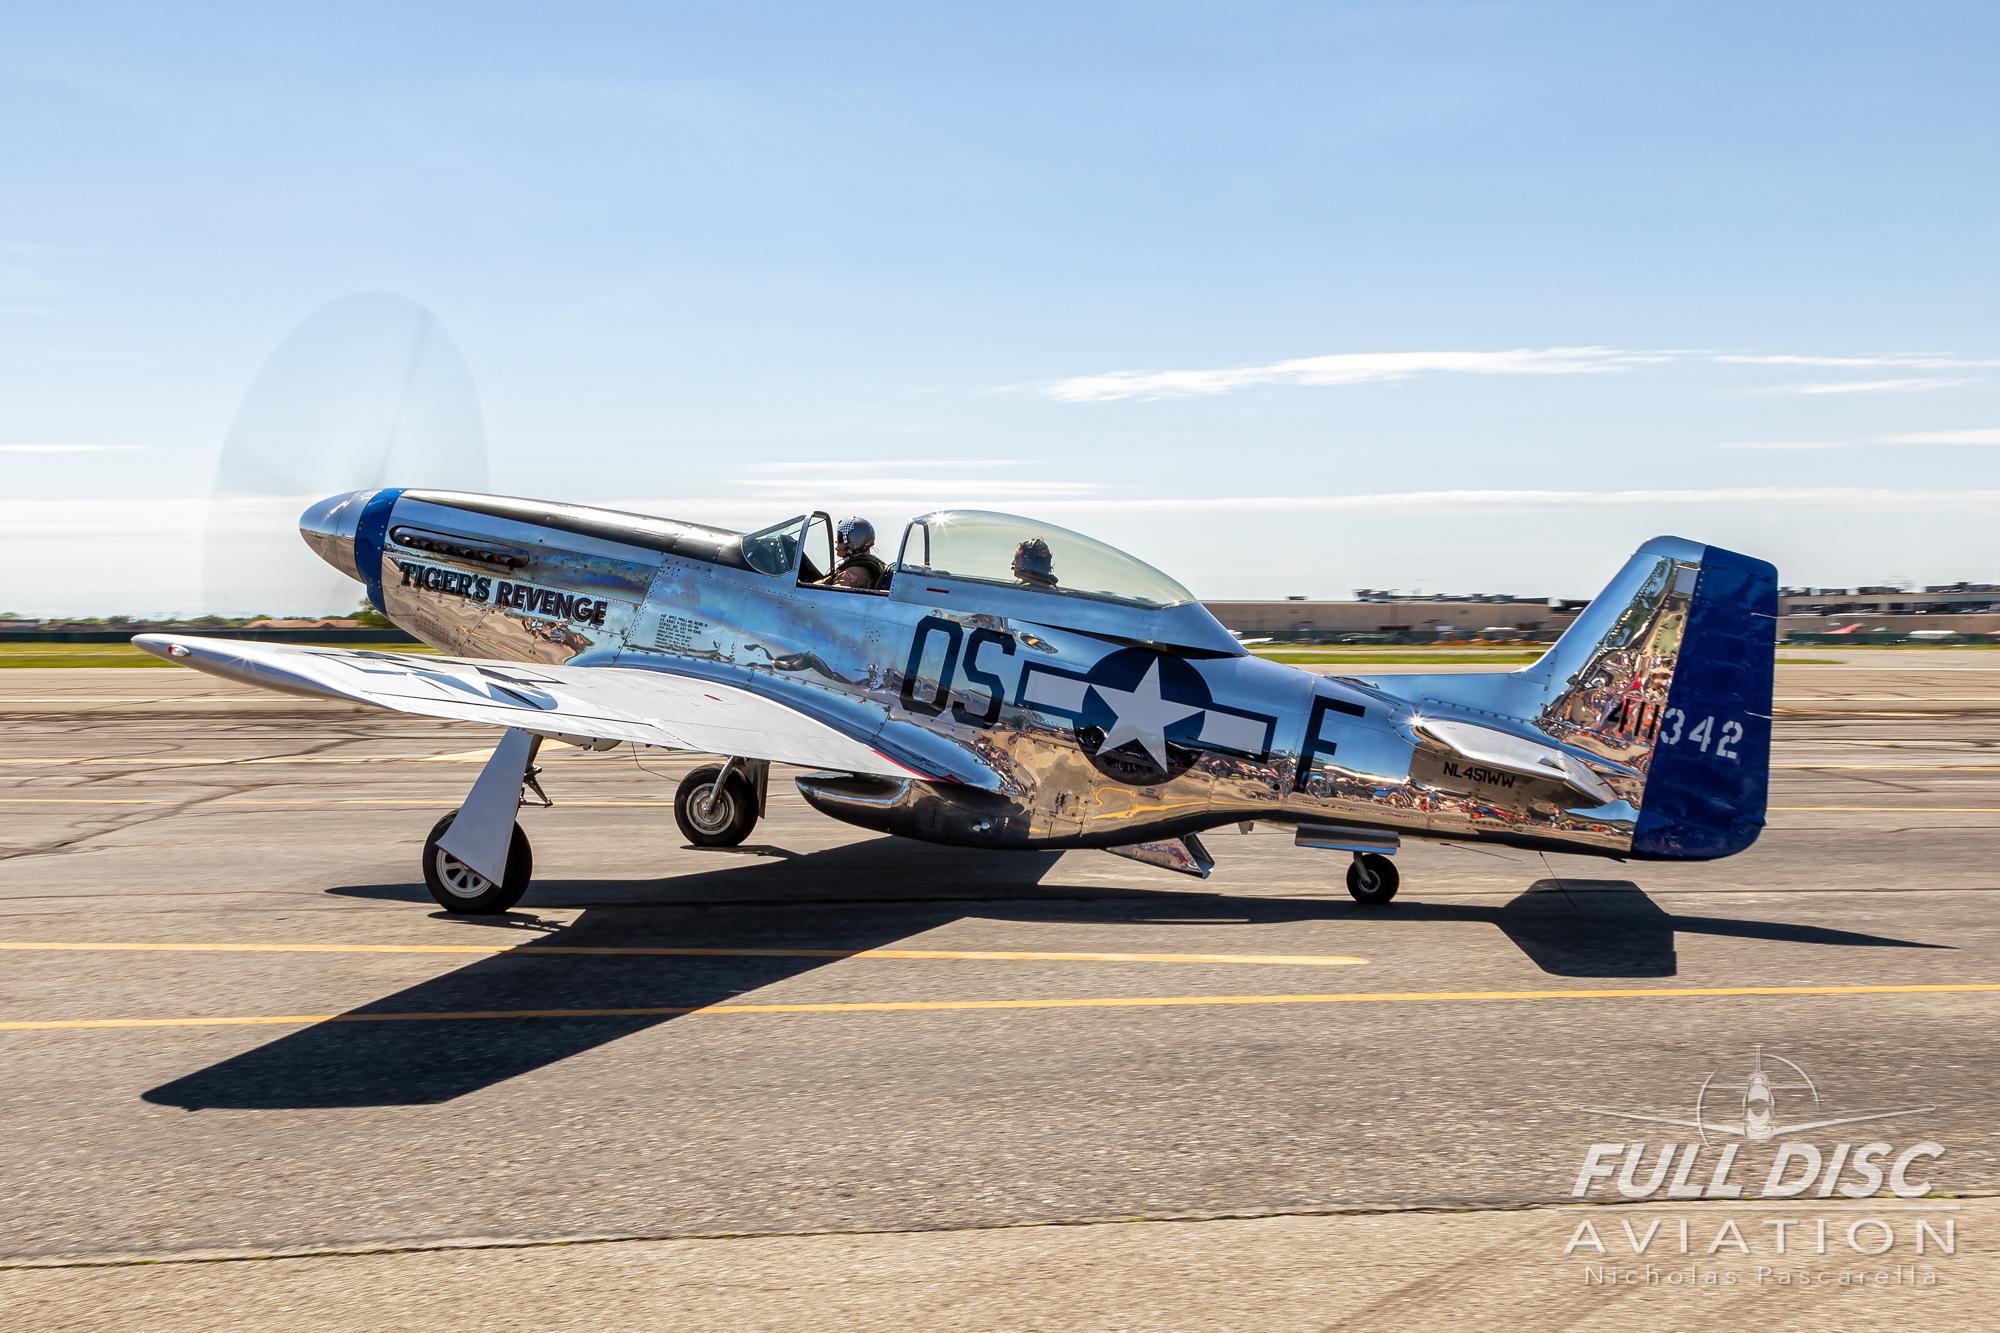 americanairpowermuseum_nicholaspascarella_nickpascarella_fulldiscaviation_legendsofairpower2019_aviation_warbird_p51mustang_shiny_polished_taxi_.jpg